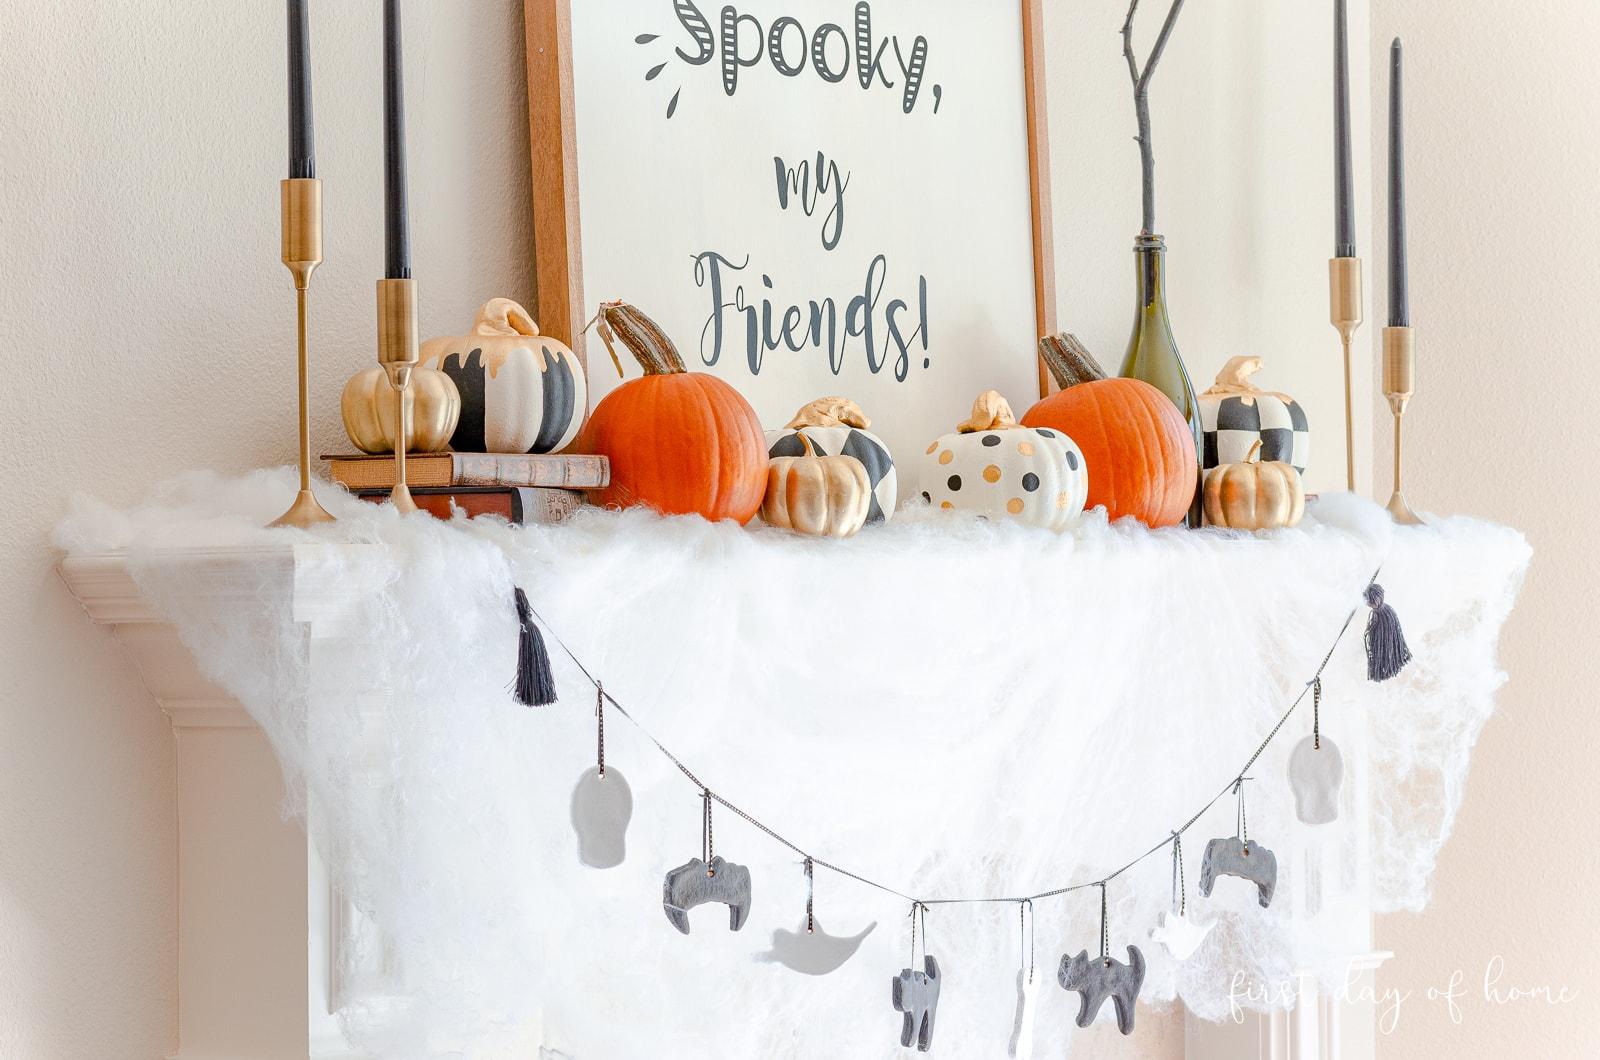 Halloween mantel with foam pumpkins, salt dough ornament garland and DIY farmhouse style sign